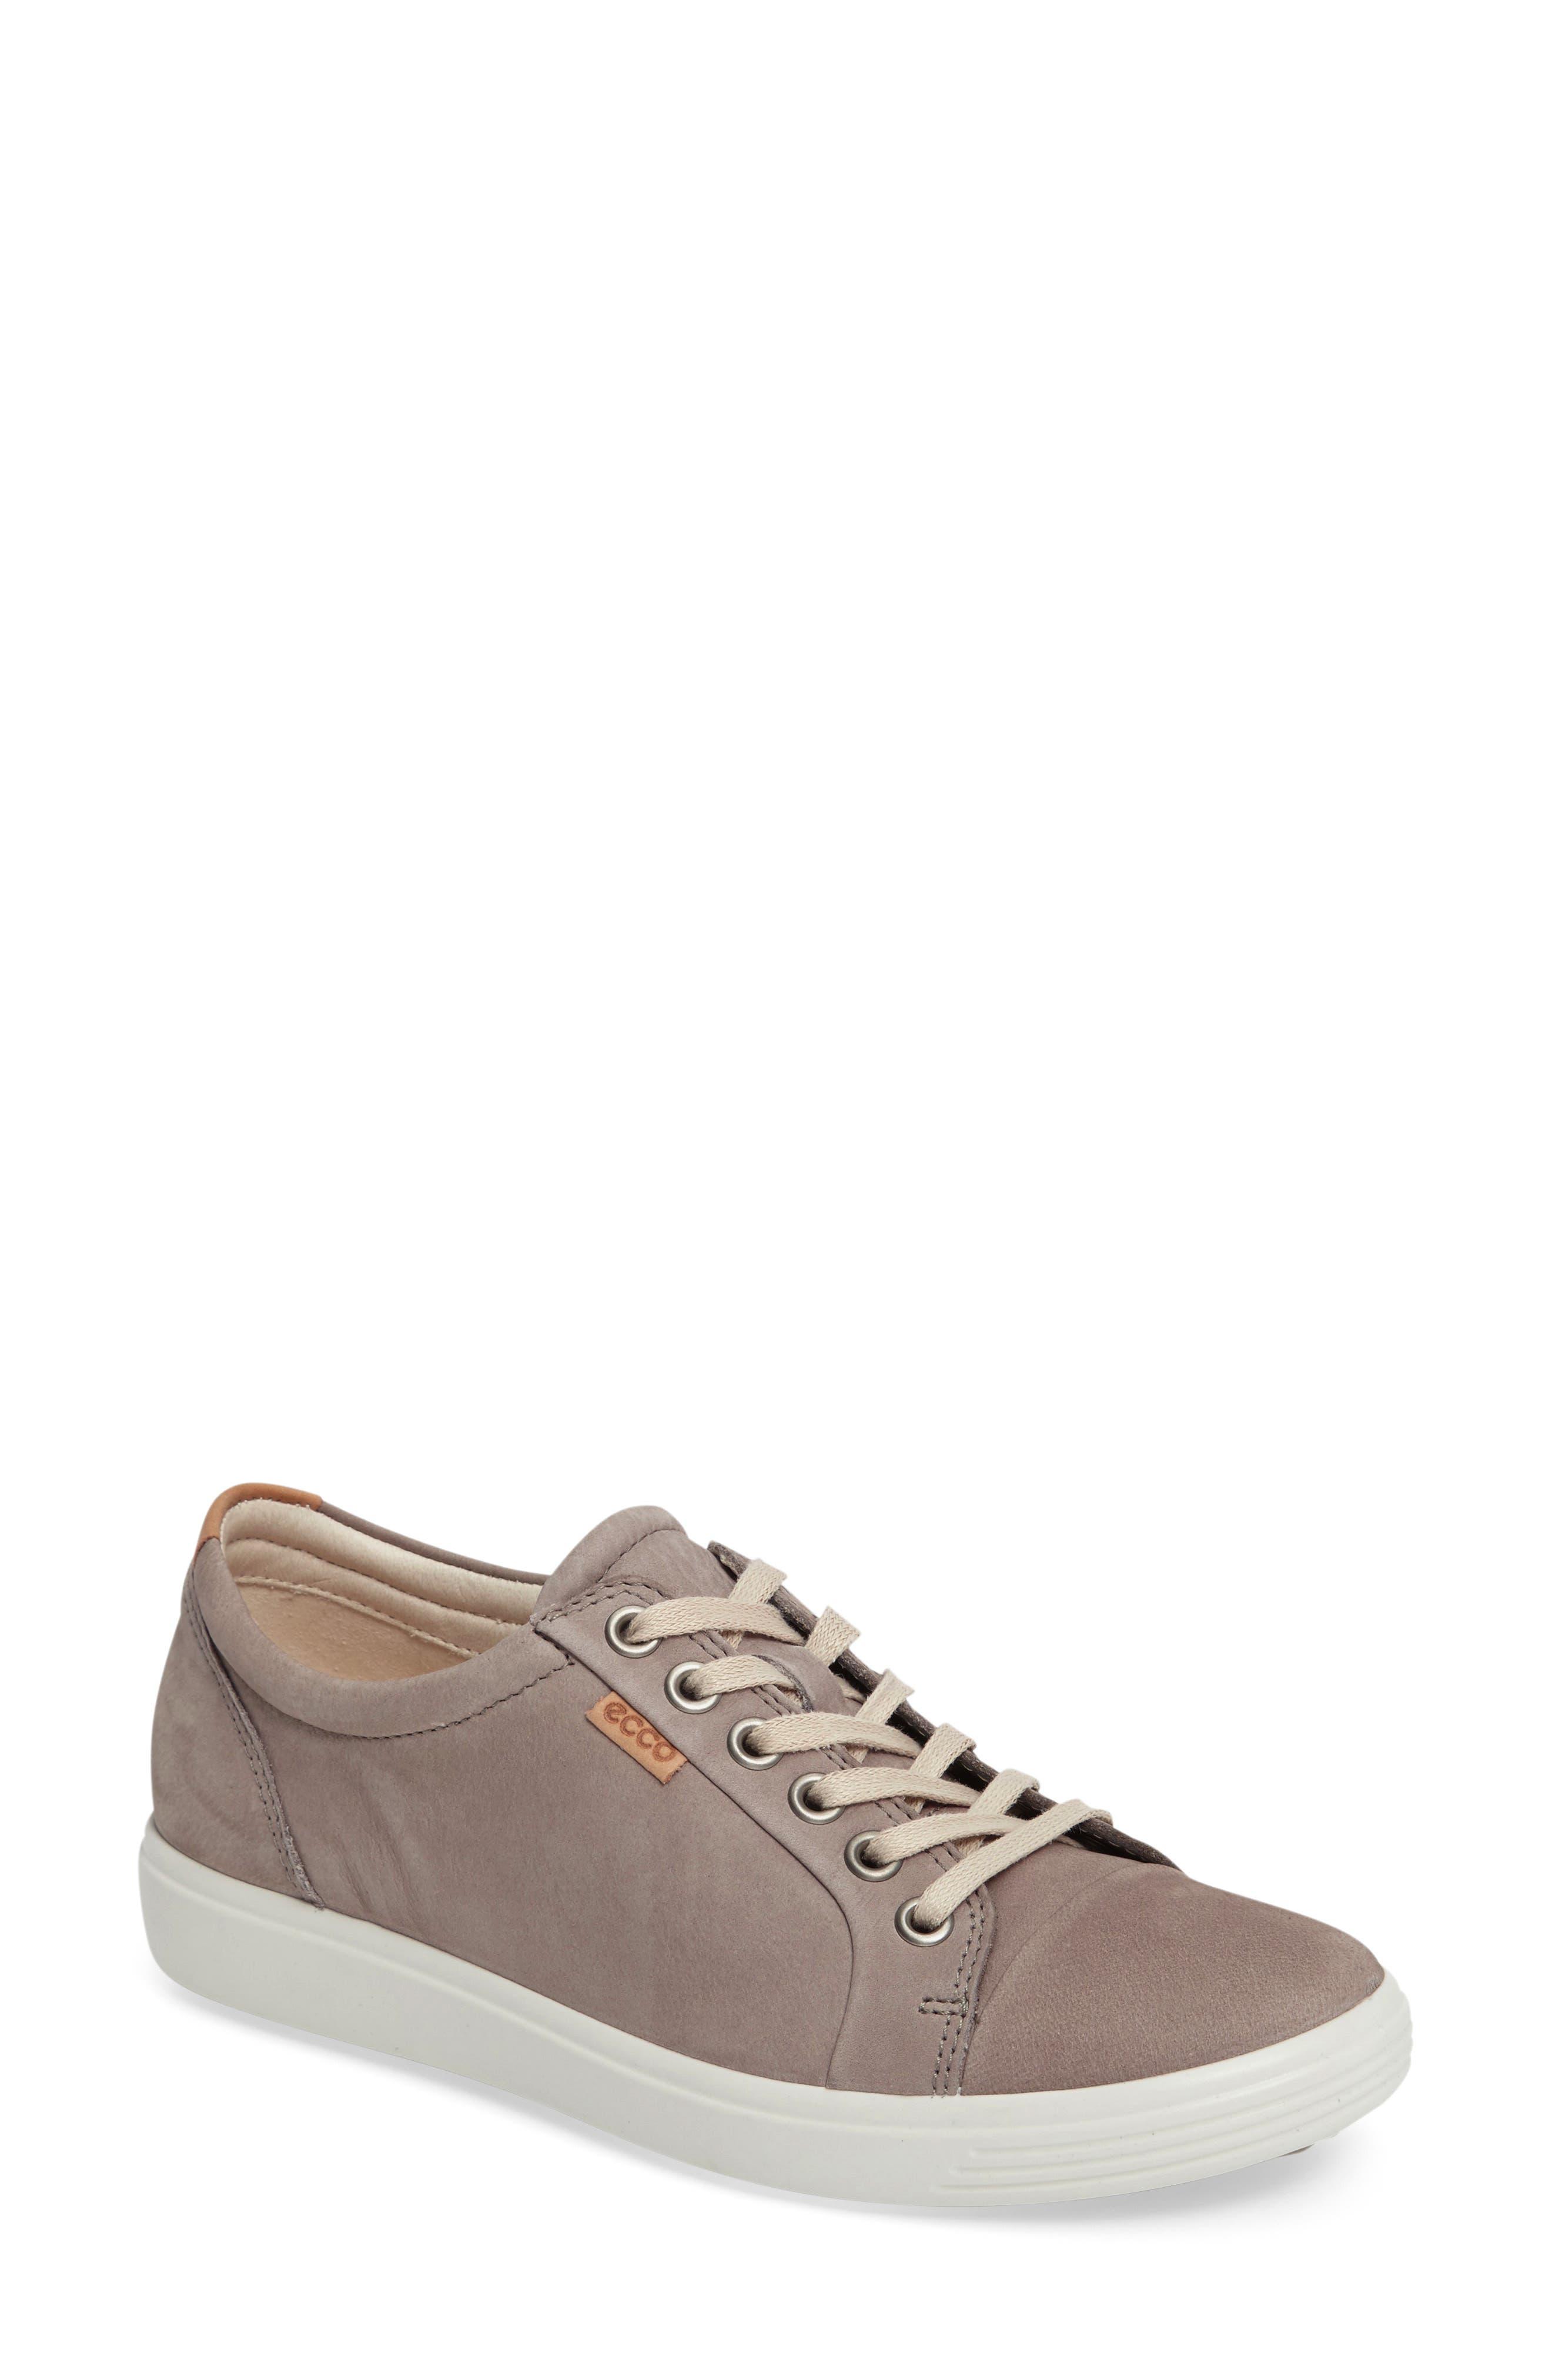 ECCO Women's Ecco Soft 7 Sneaker, Size 5-5.5US - Grey